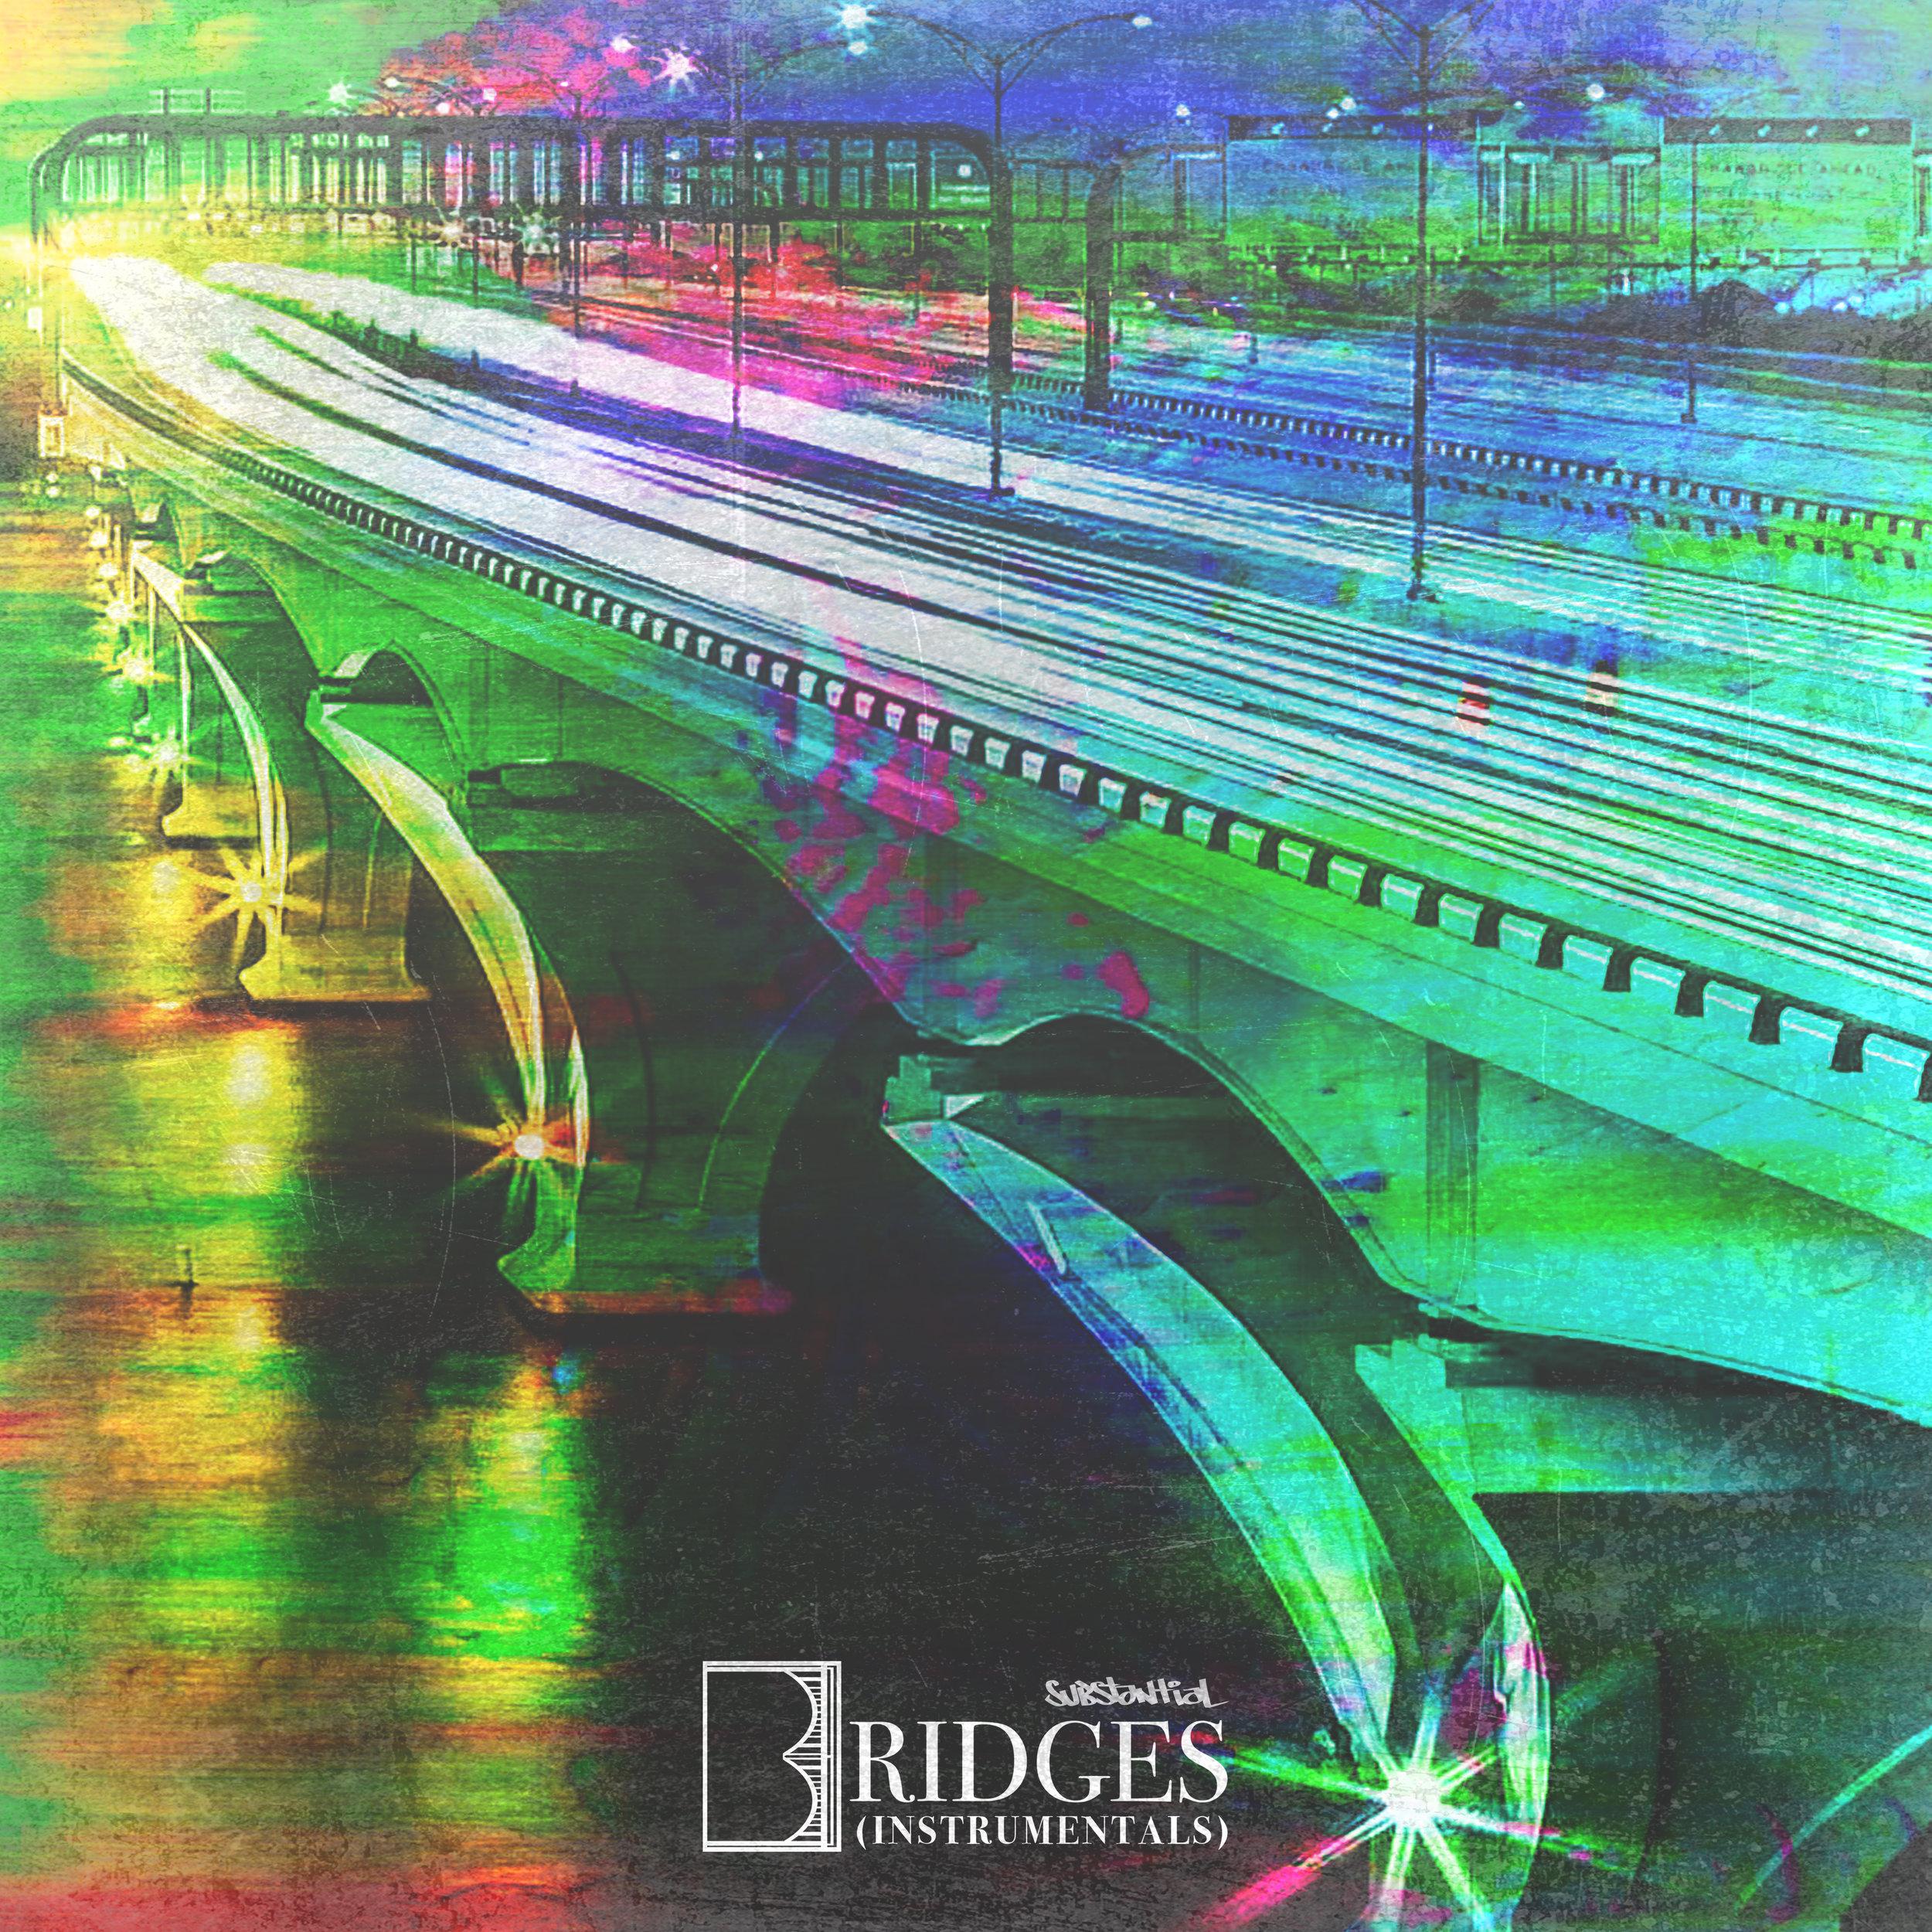 Bridges-Instrumental-Cover.jpg